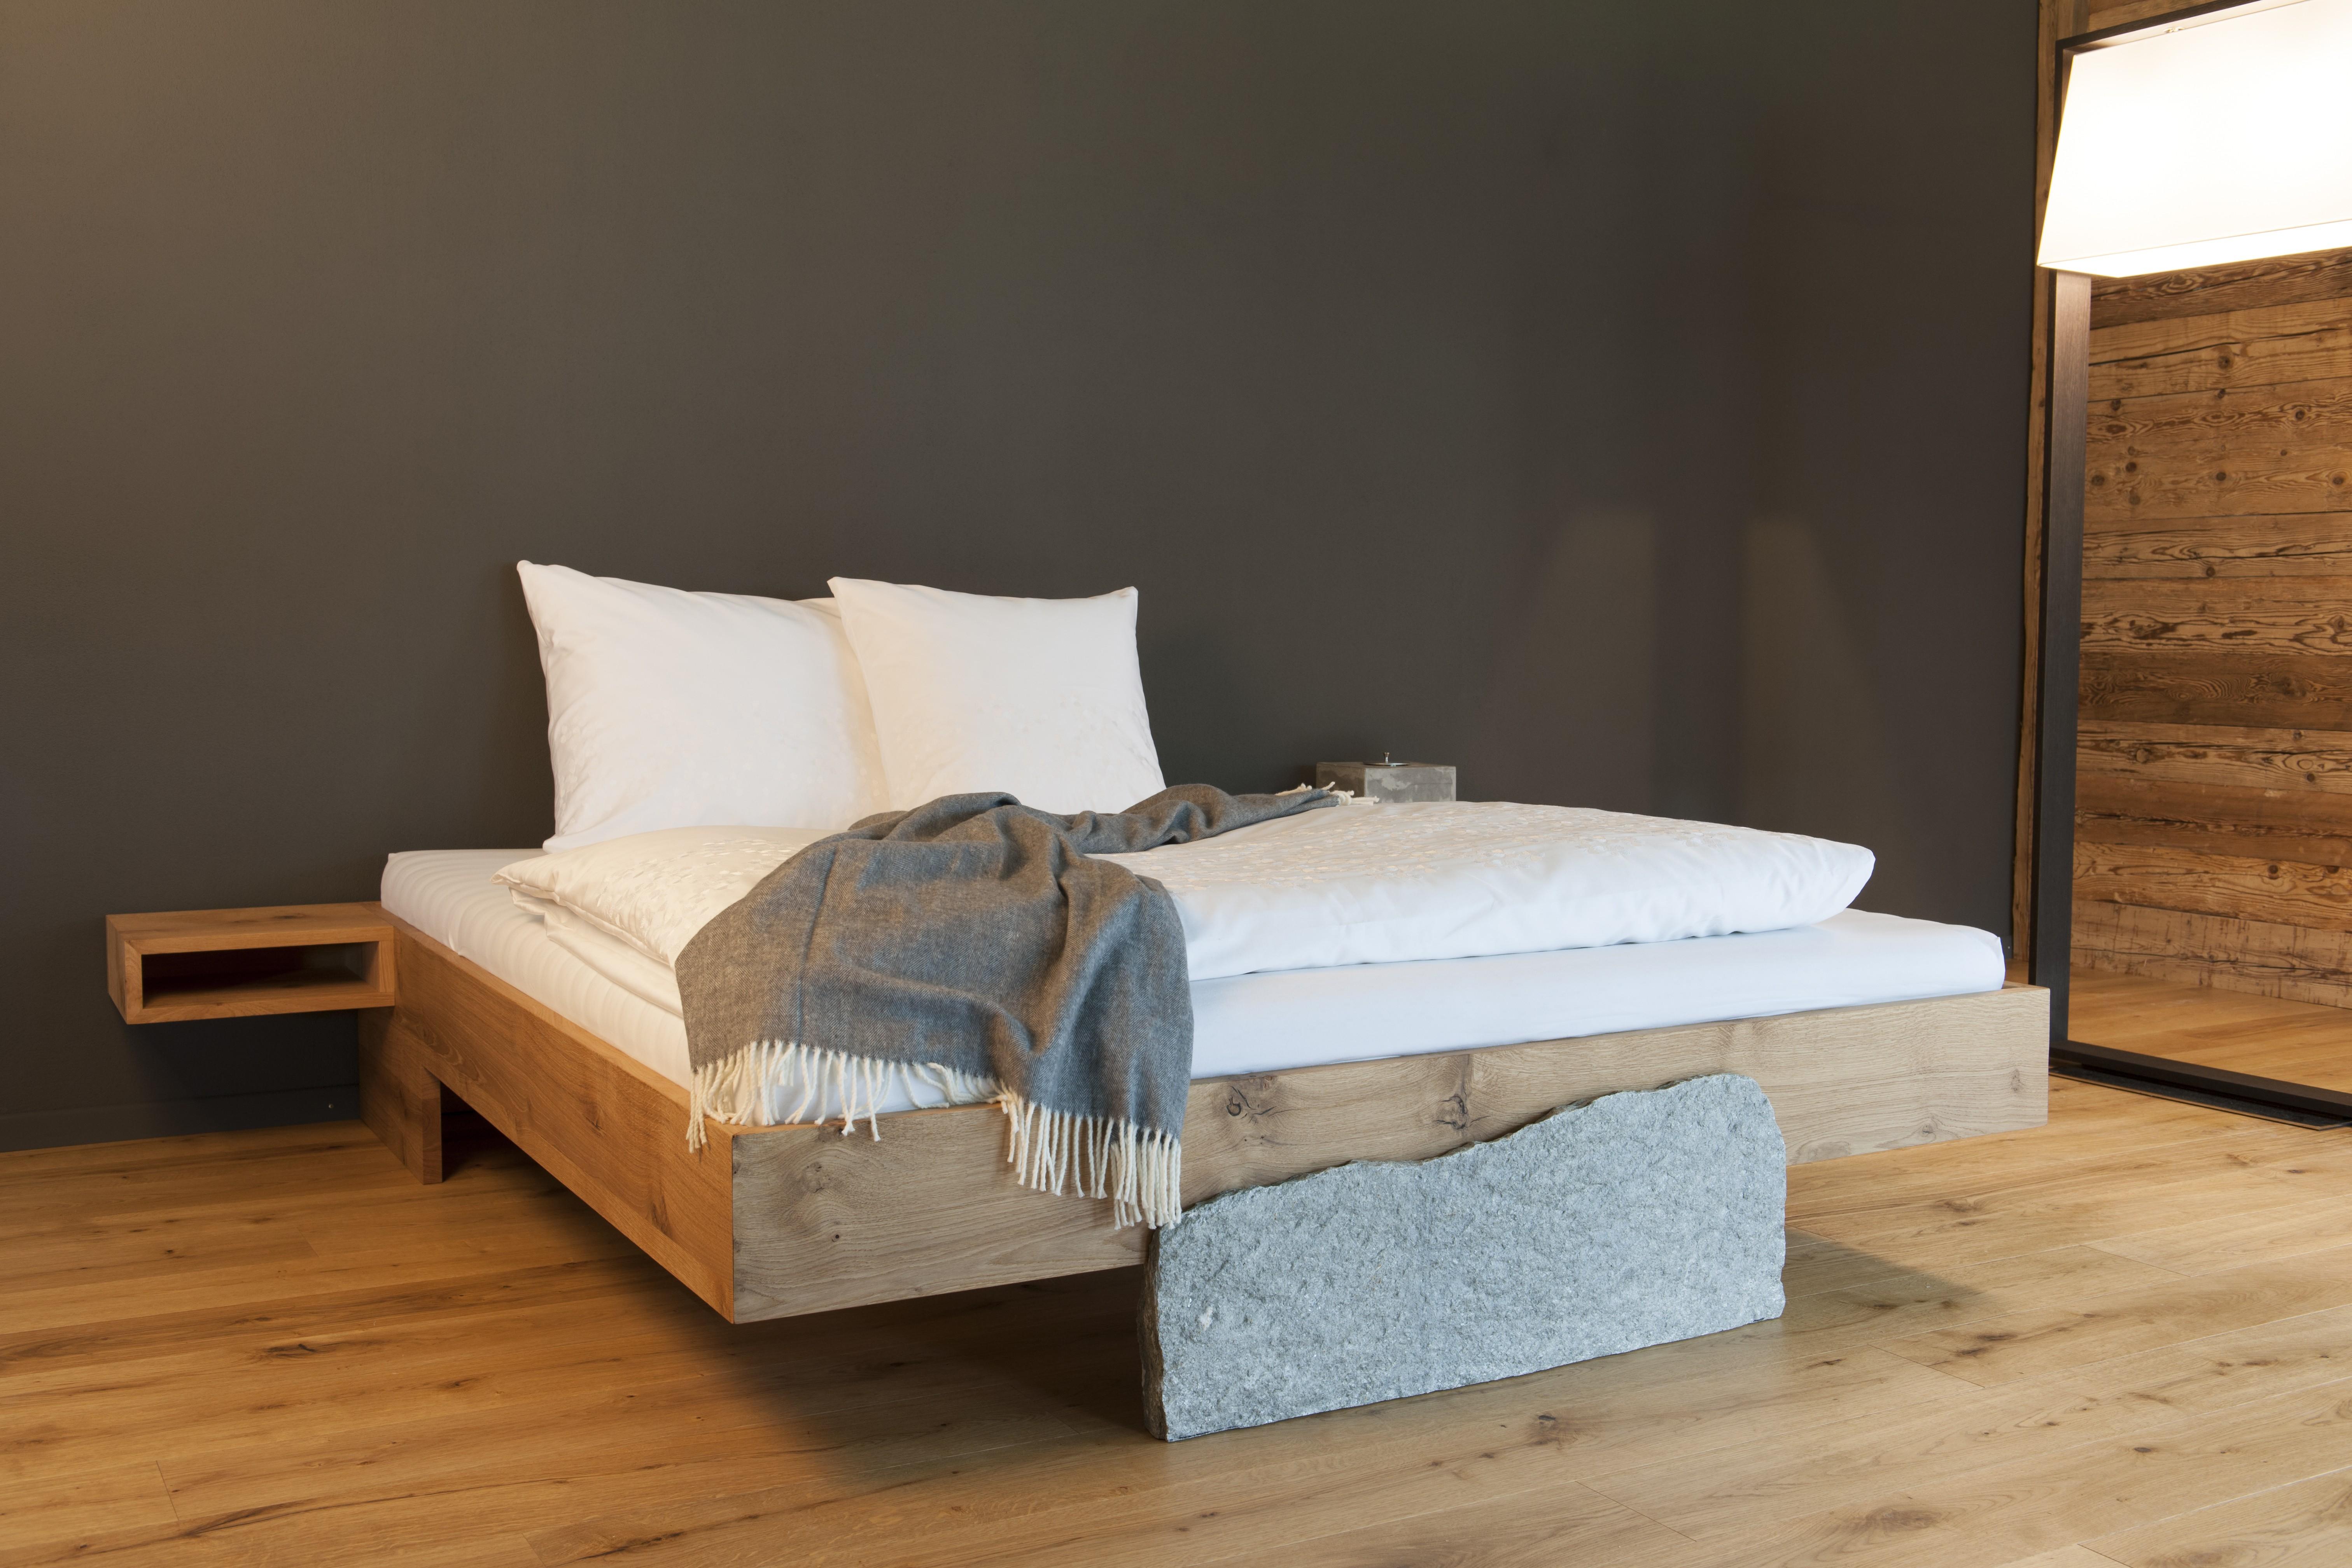 Massivholzbett guarda vitalana nat rlich schlafen und wohnen for Massivholz bett